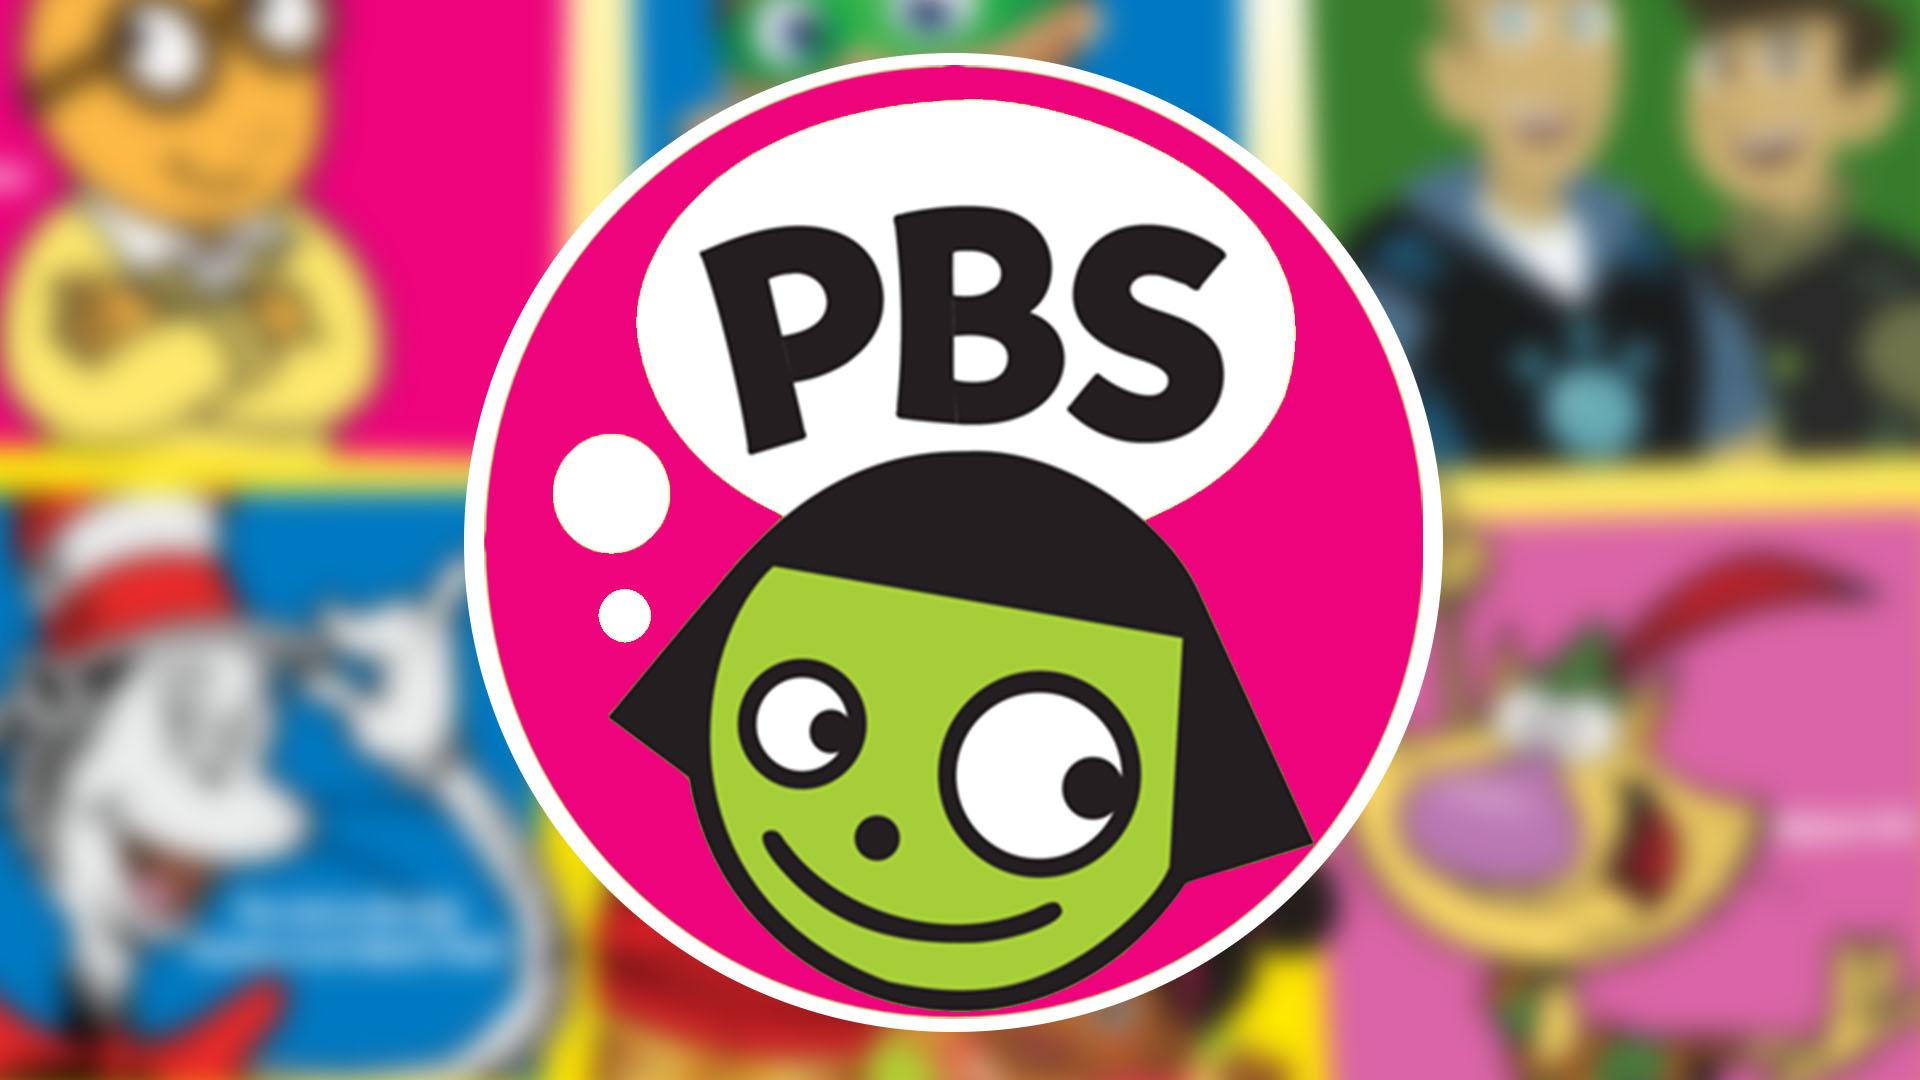 Watch PBS Kids 24/7 Online now!